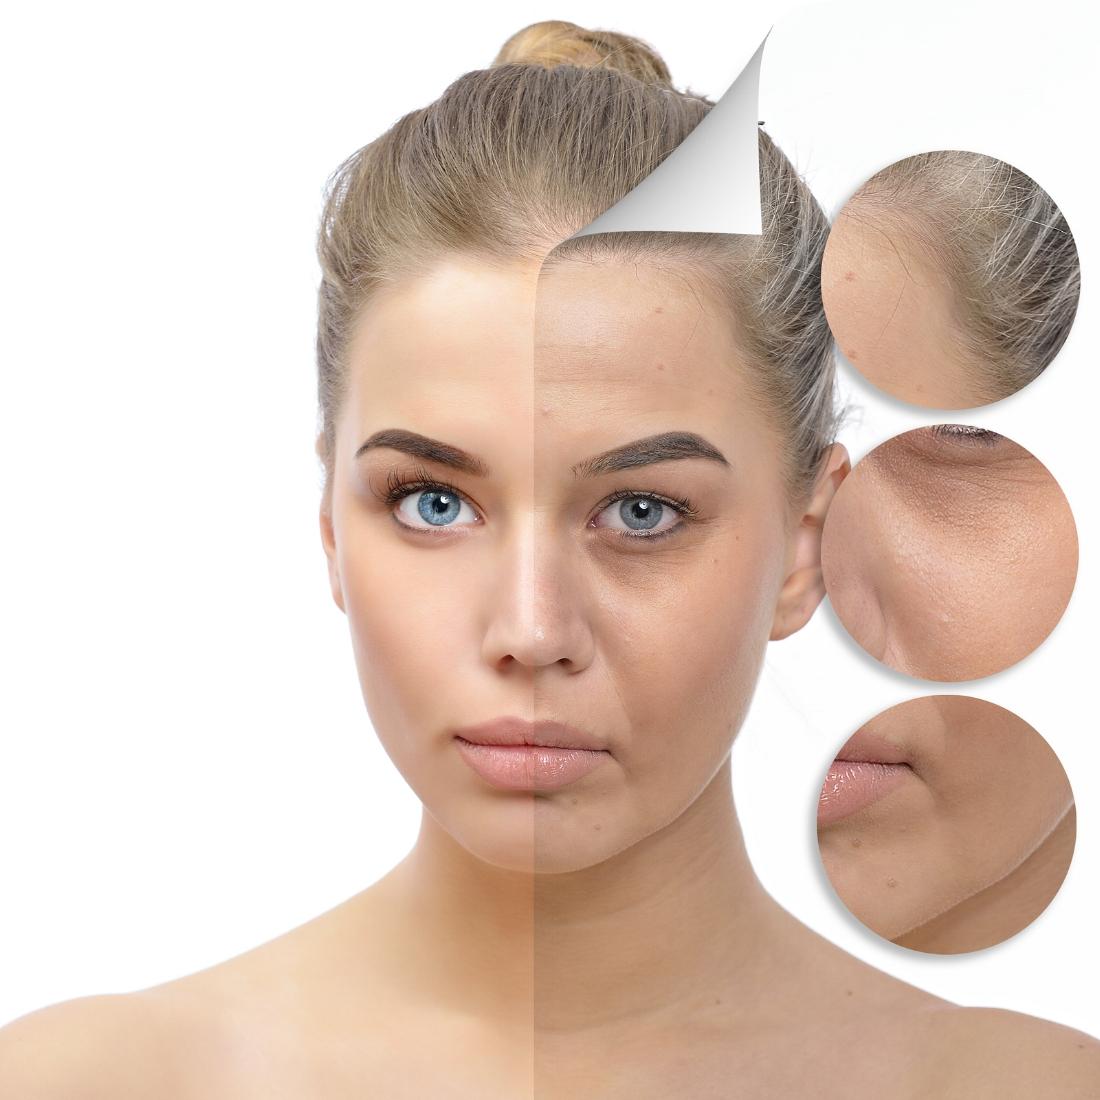 bigstock-Anti-aging-concept-Beautiful--120933695.jpg